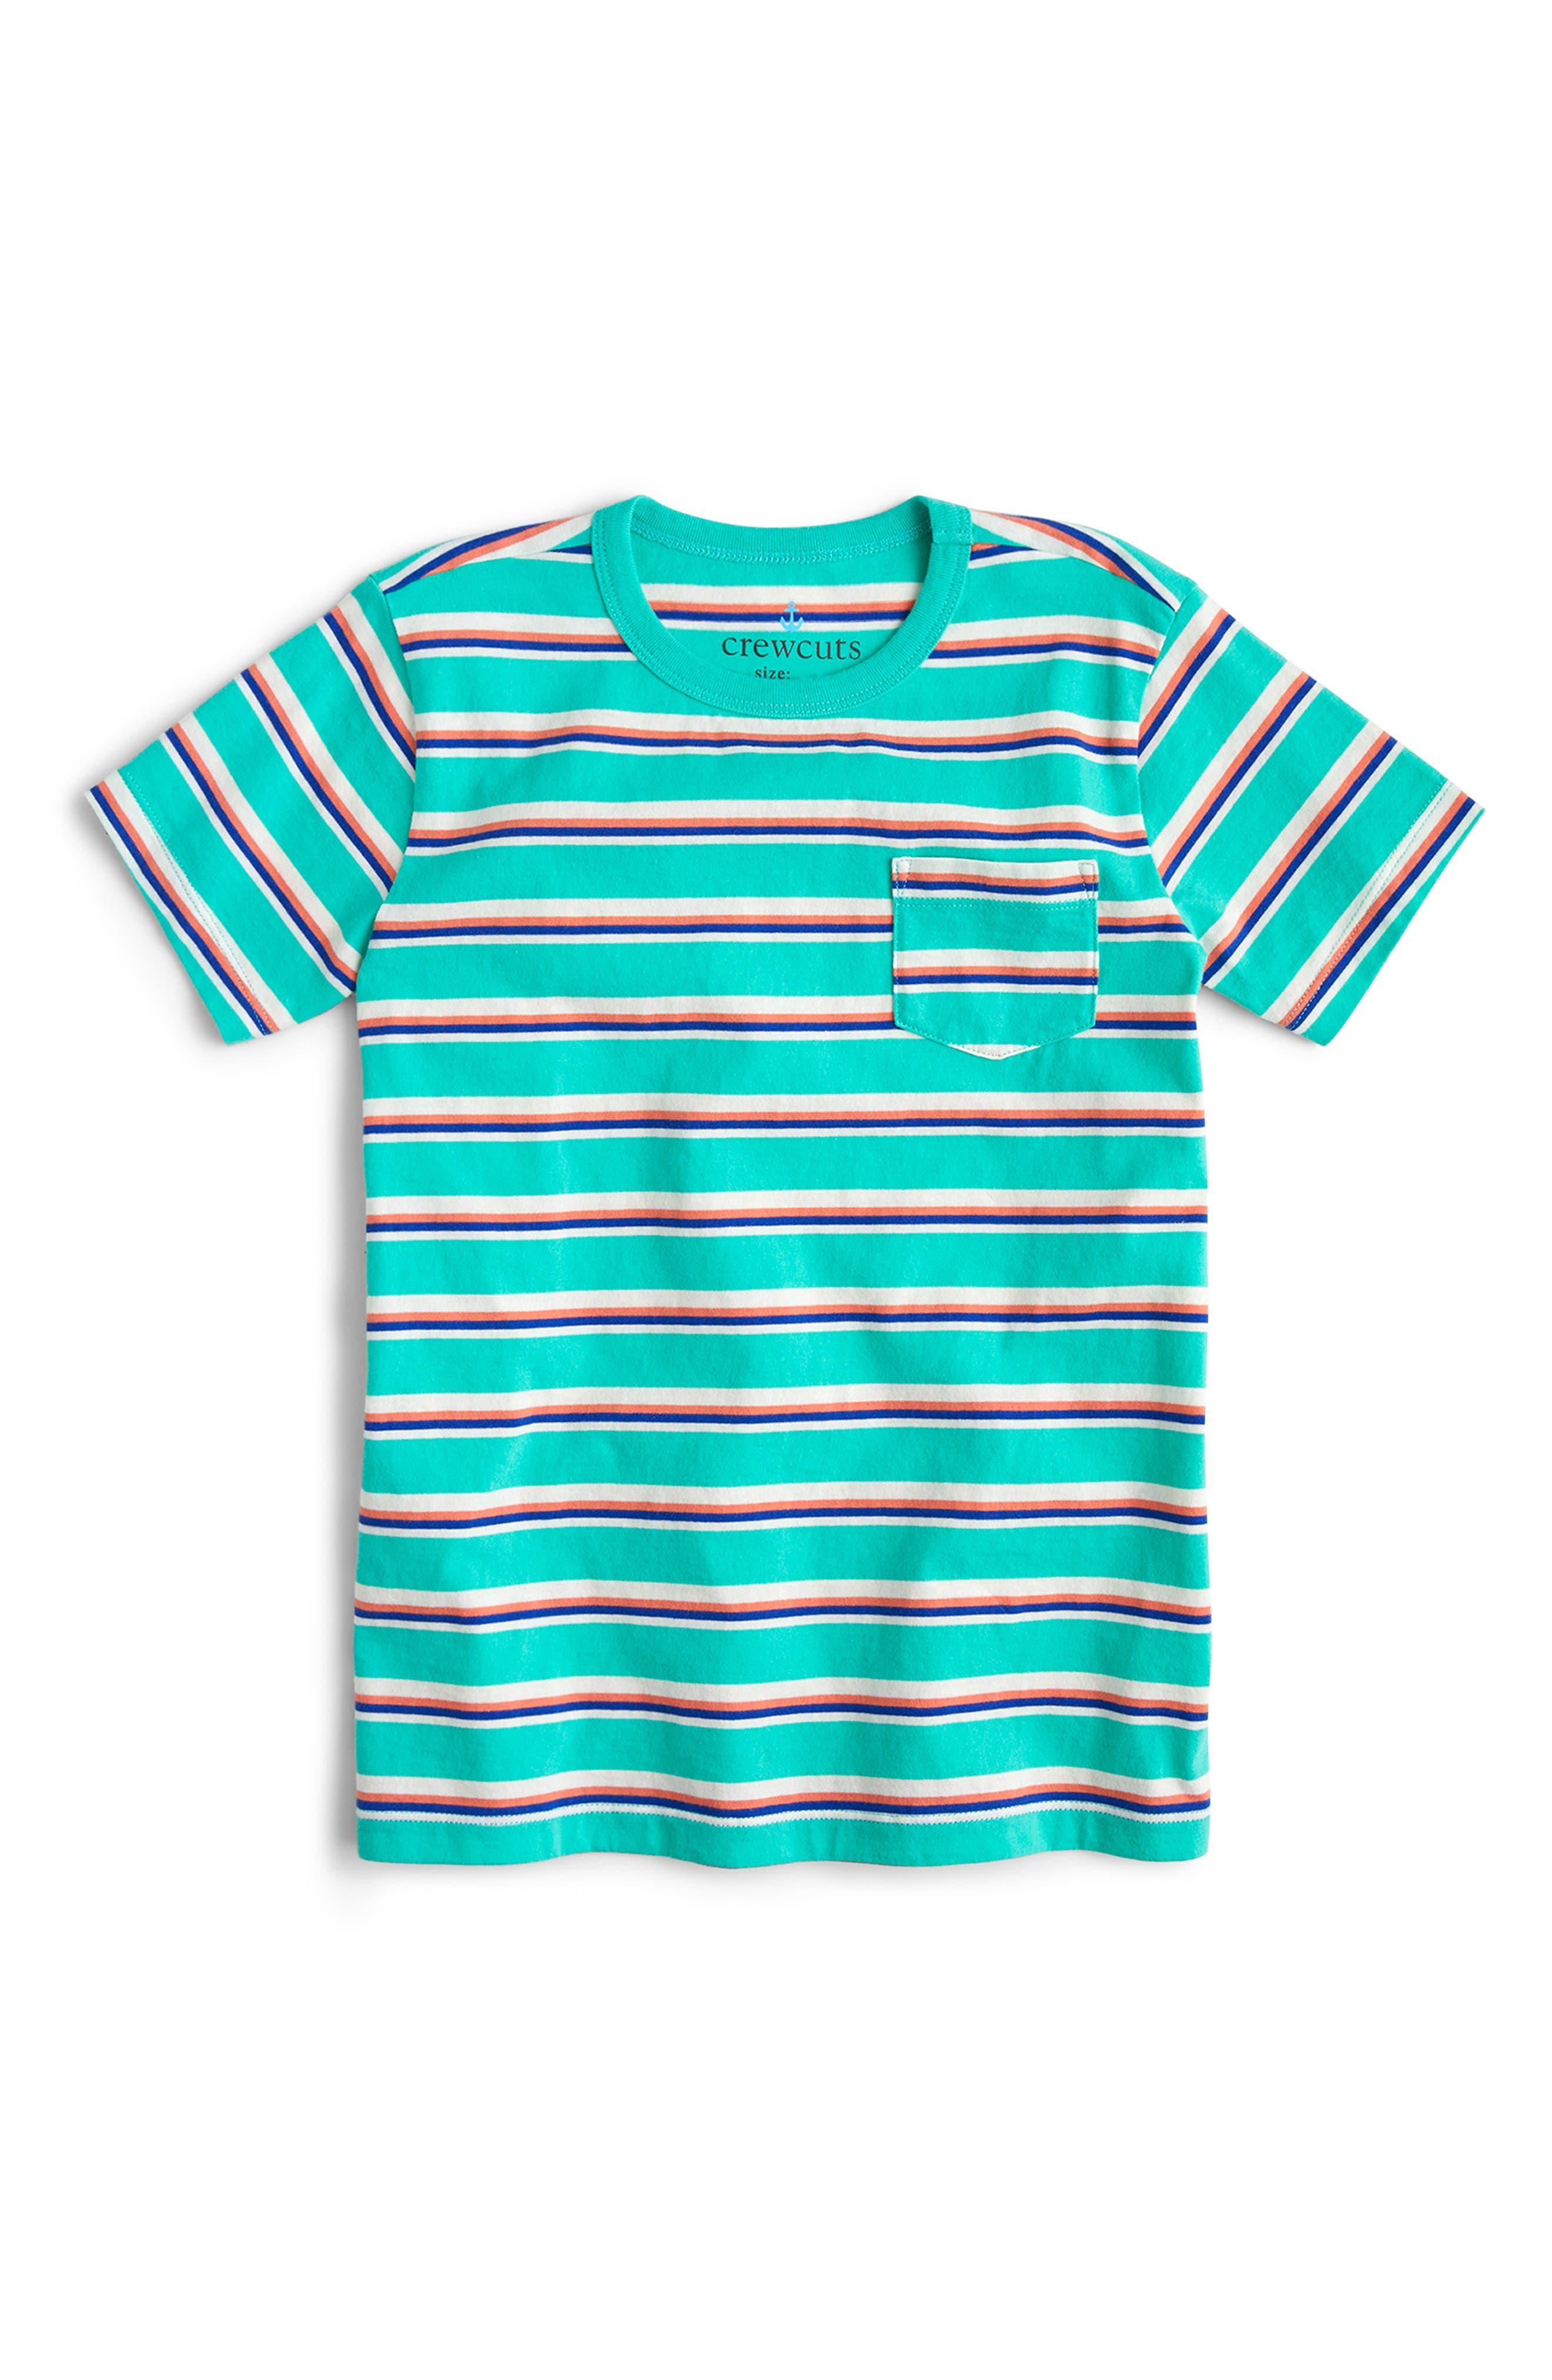 Boys Crewcuts By Jcrew Stripe Pocket TShirt Size 10  Bluegreen